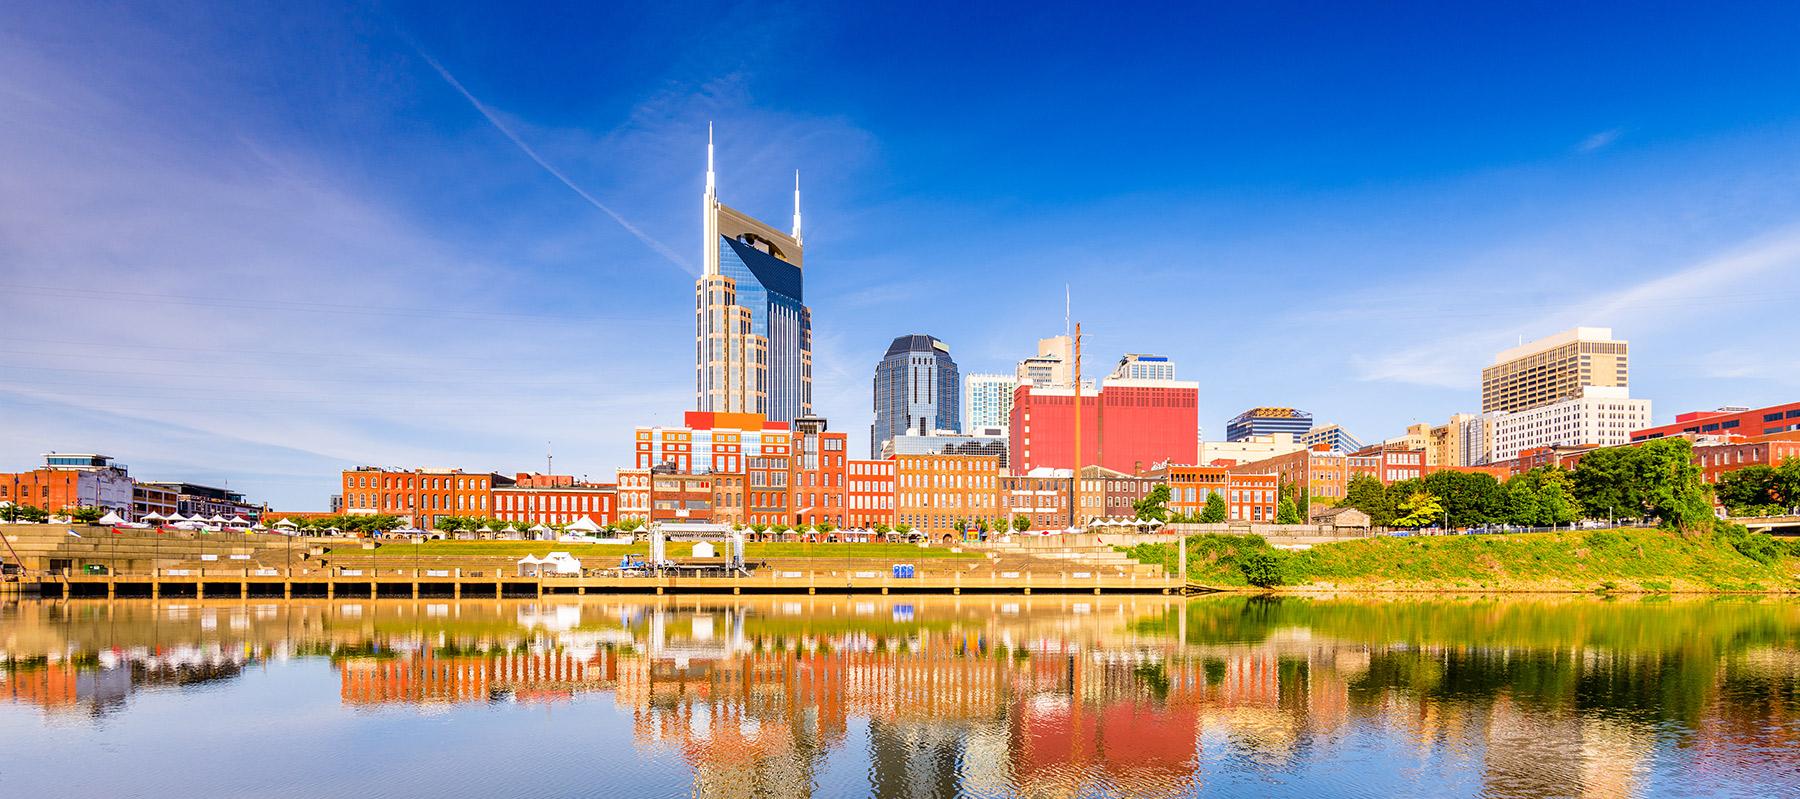 Image of Nashville, TN